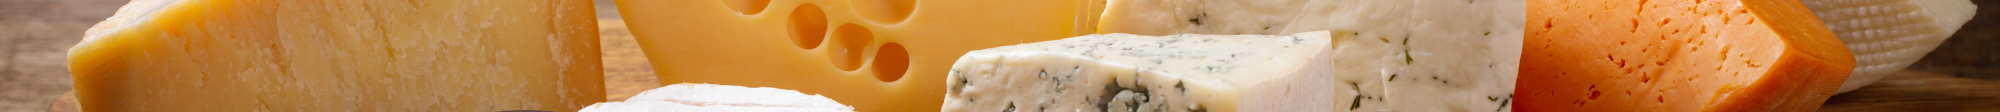 Comprar queso oveja online gourmet | Mixtura Gourmet